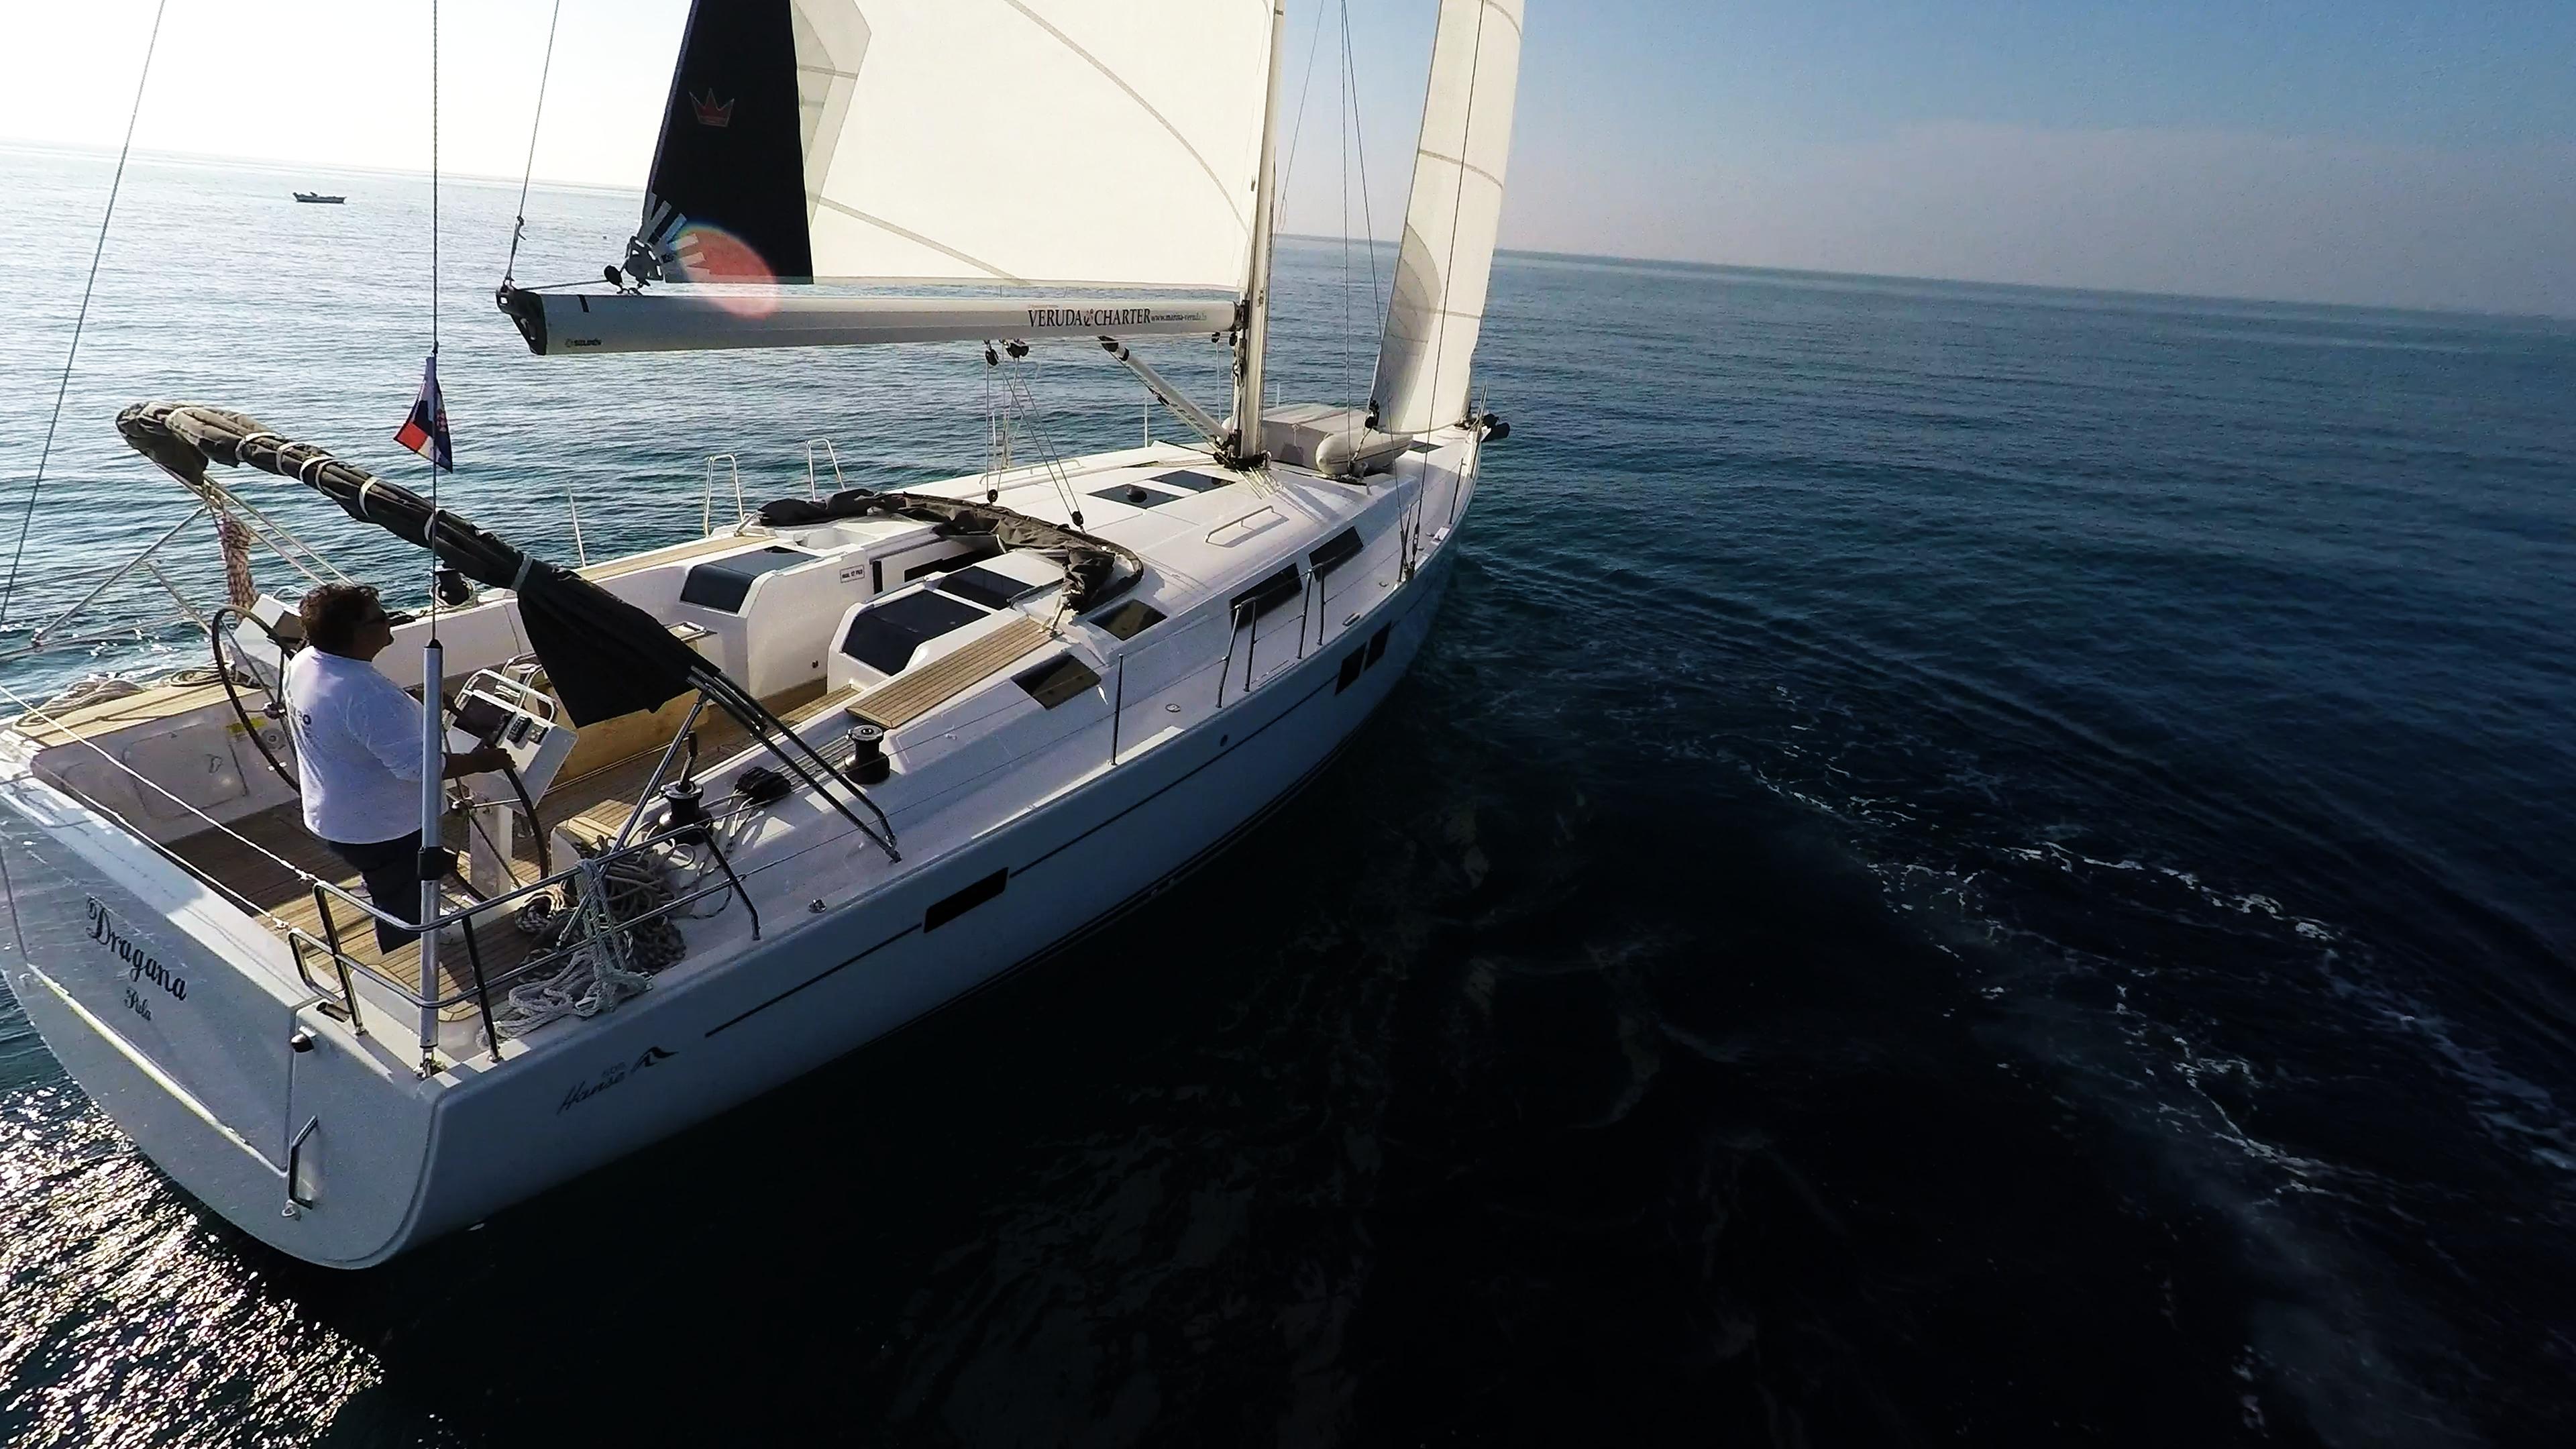 barcha a vela barca a vela yacht a vela Hanse 505 ponte pozzetto vele